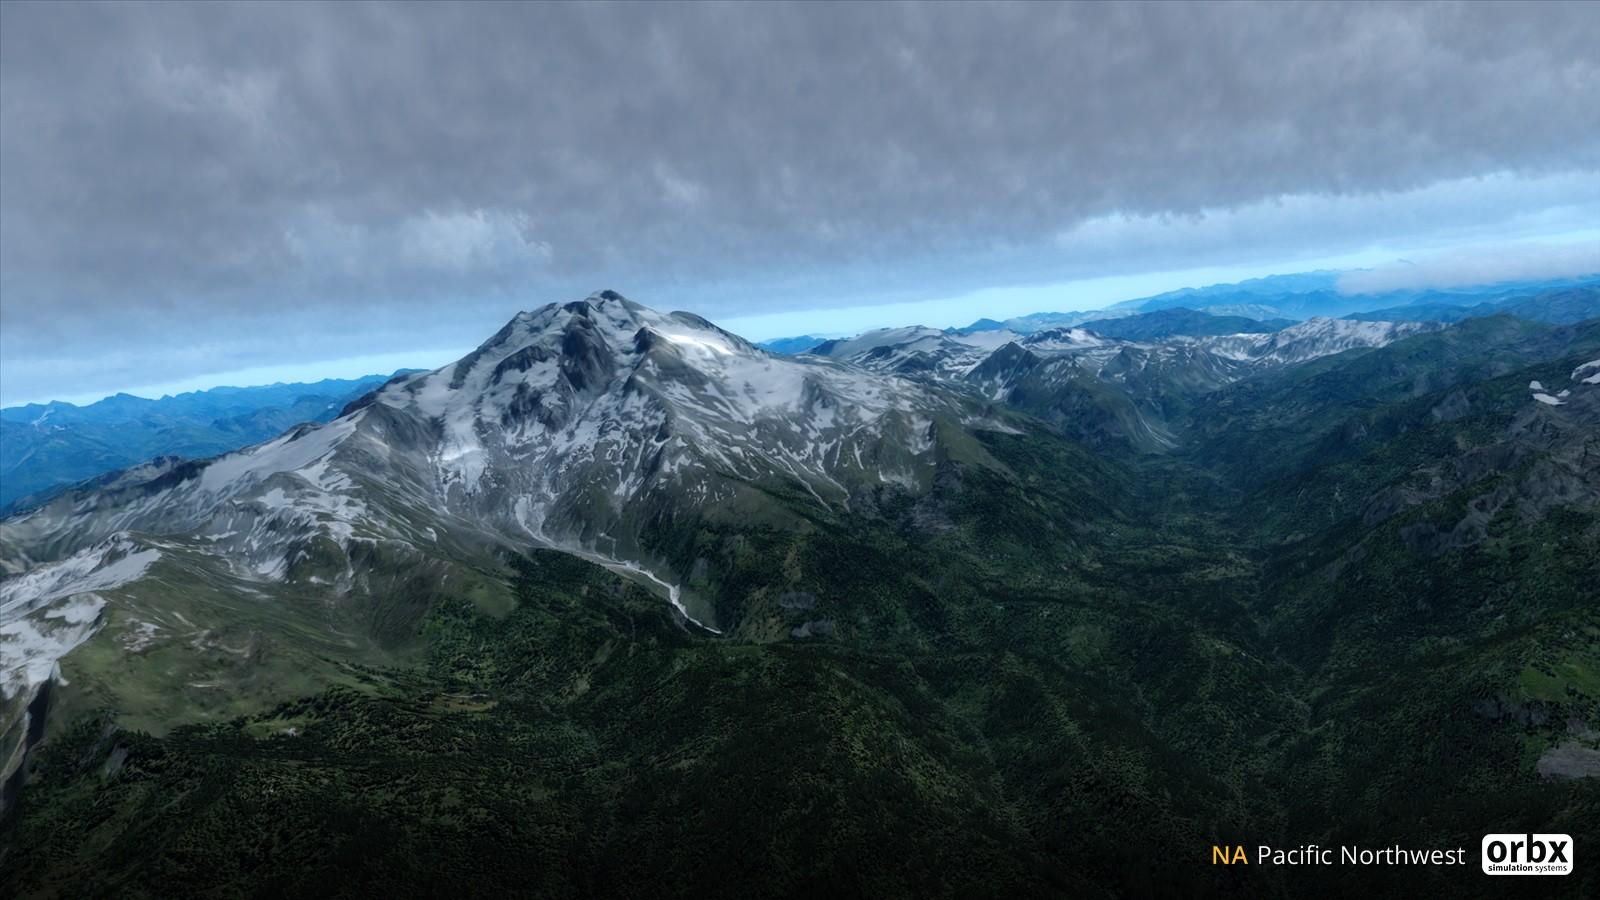 Na Pacific Northwest Orbx